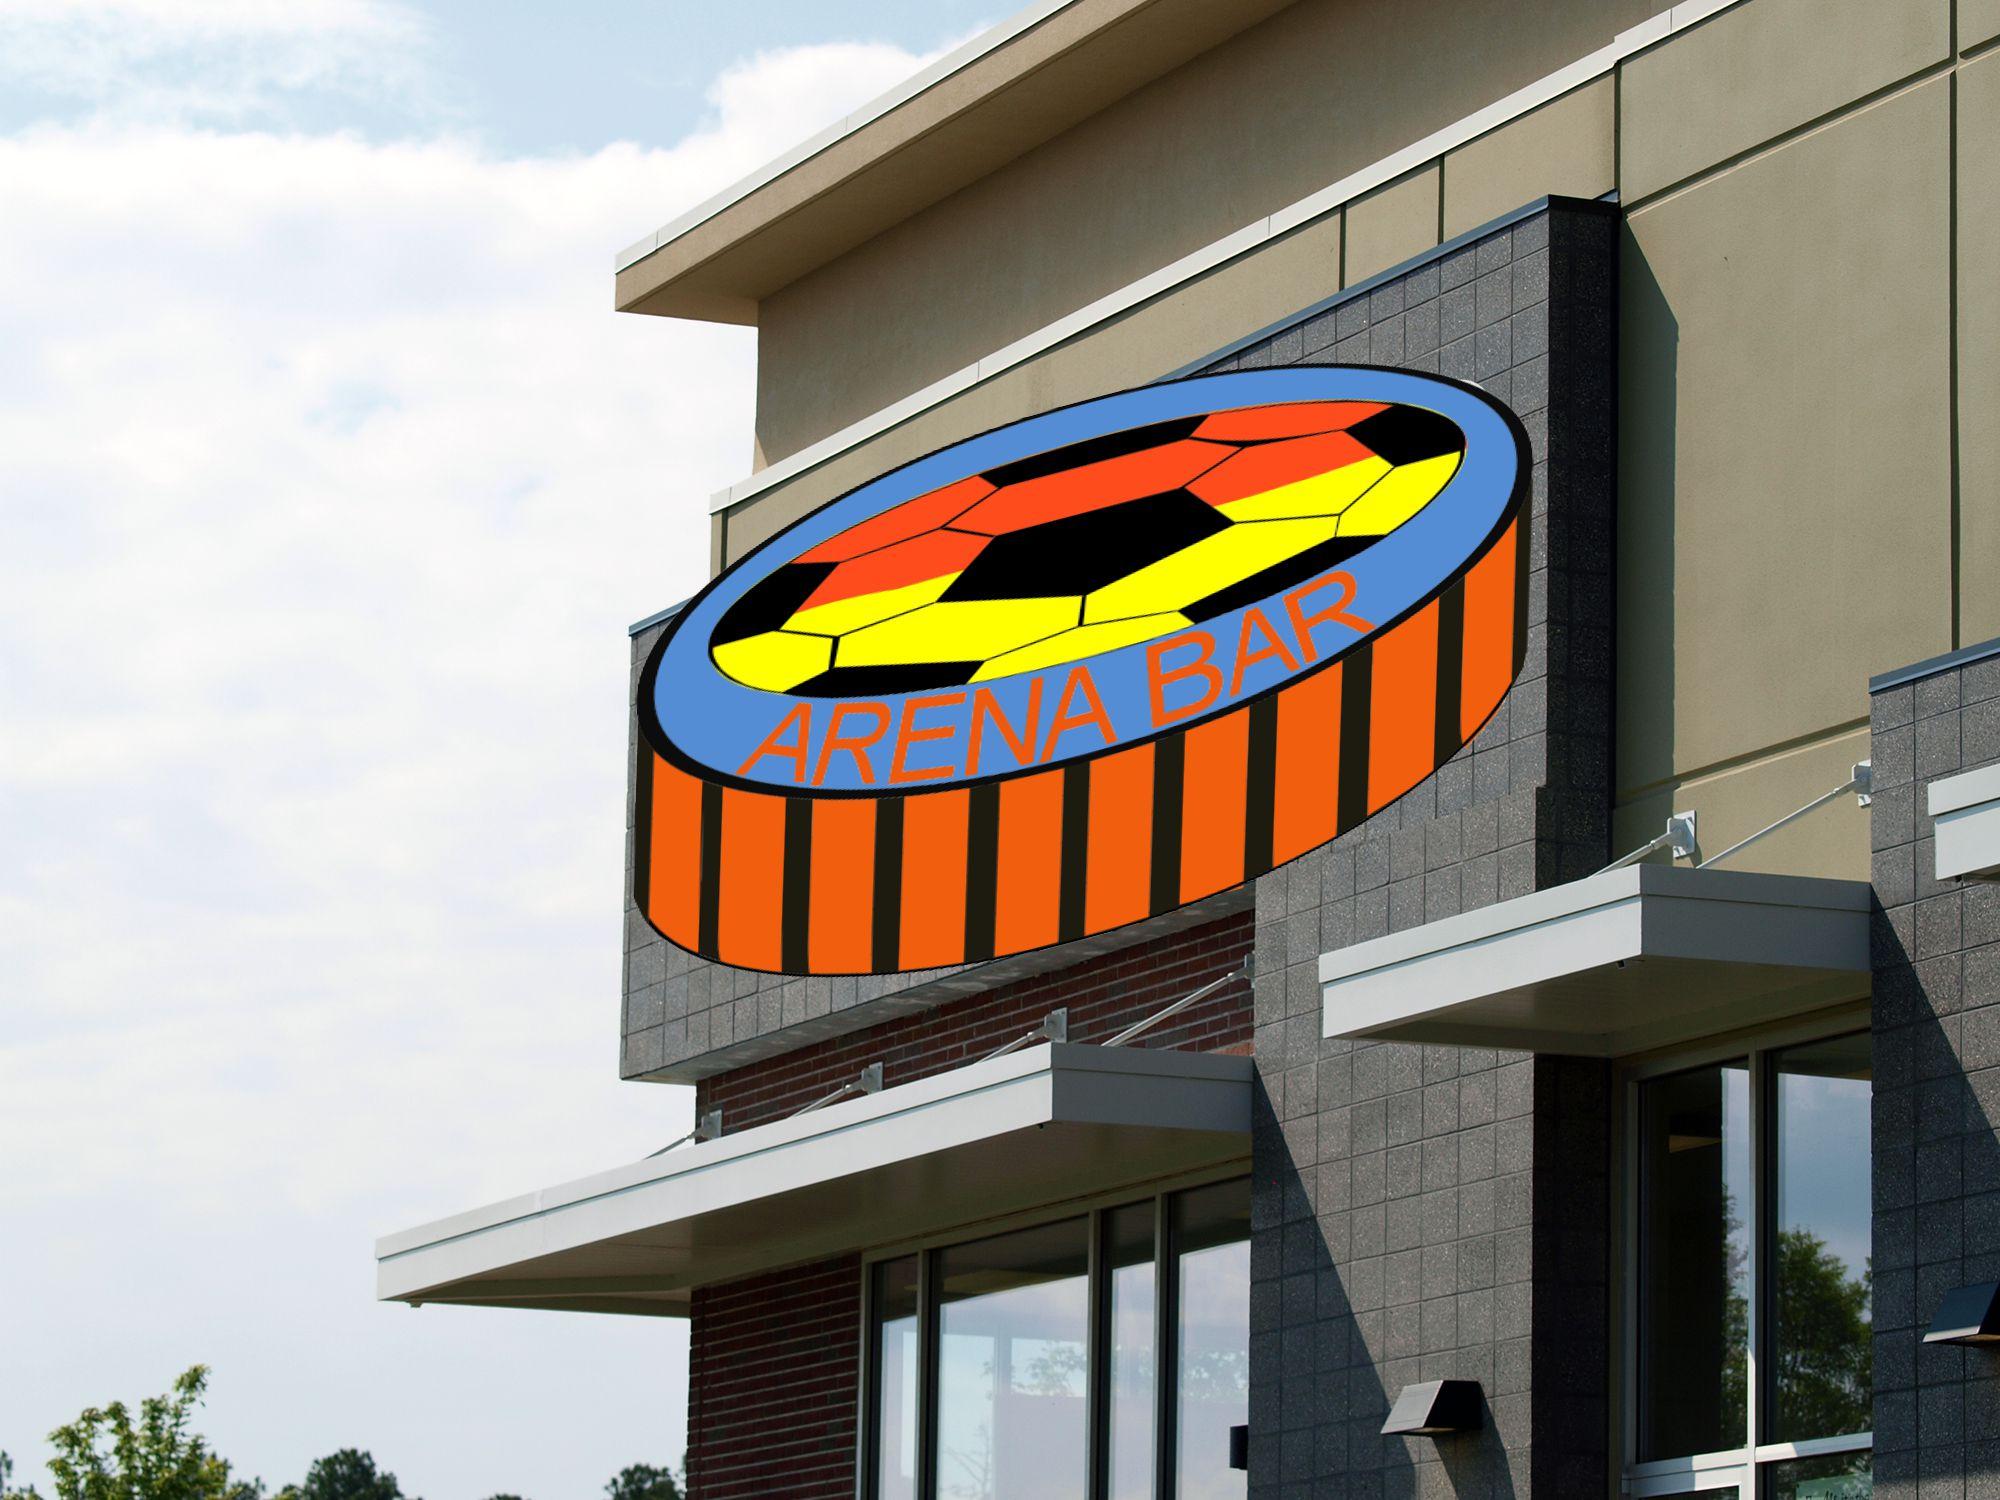 Разработка логотипа для бара! фото f_6435dcabec9b0ae9.jpg